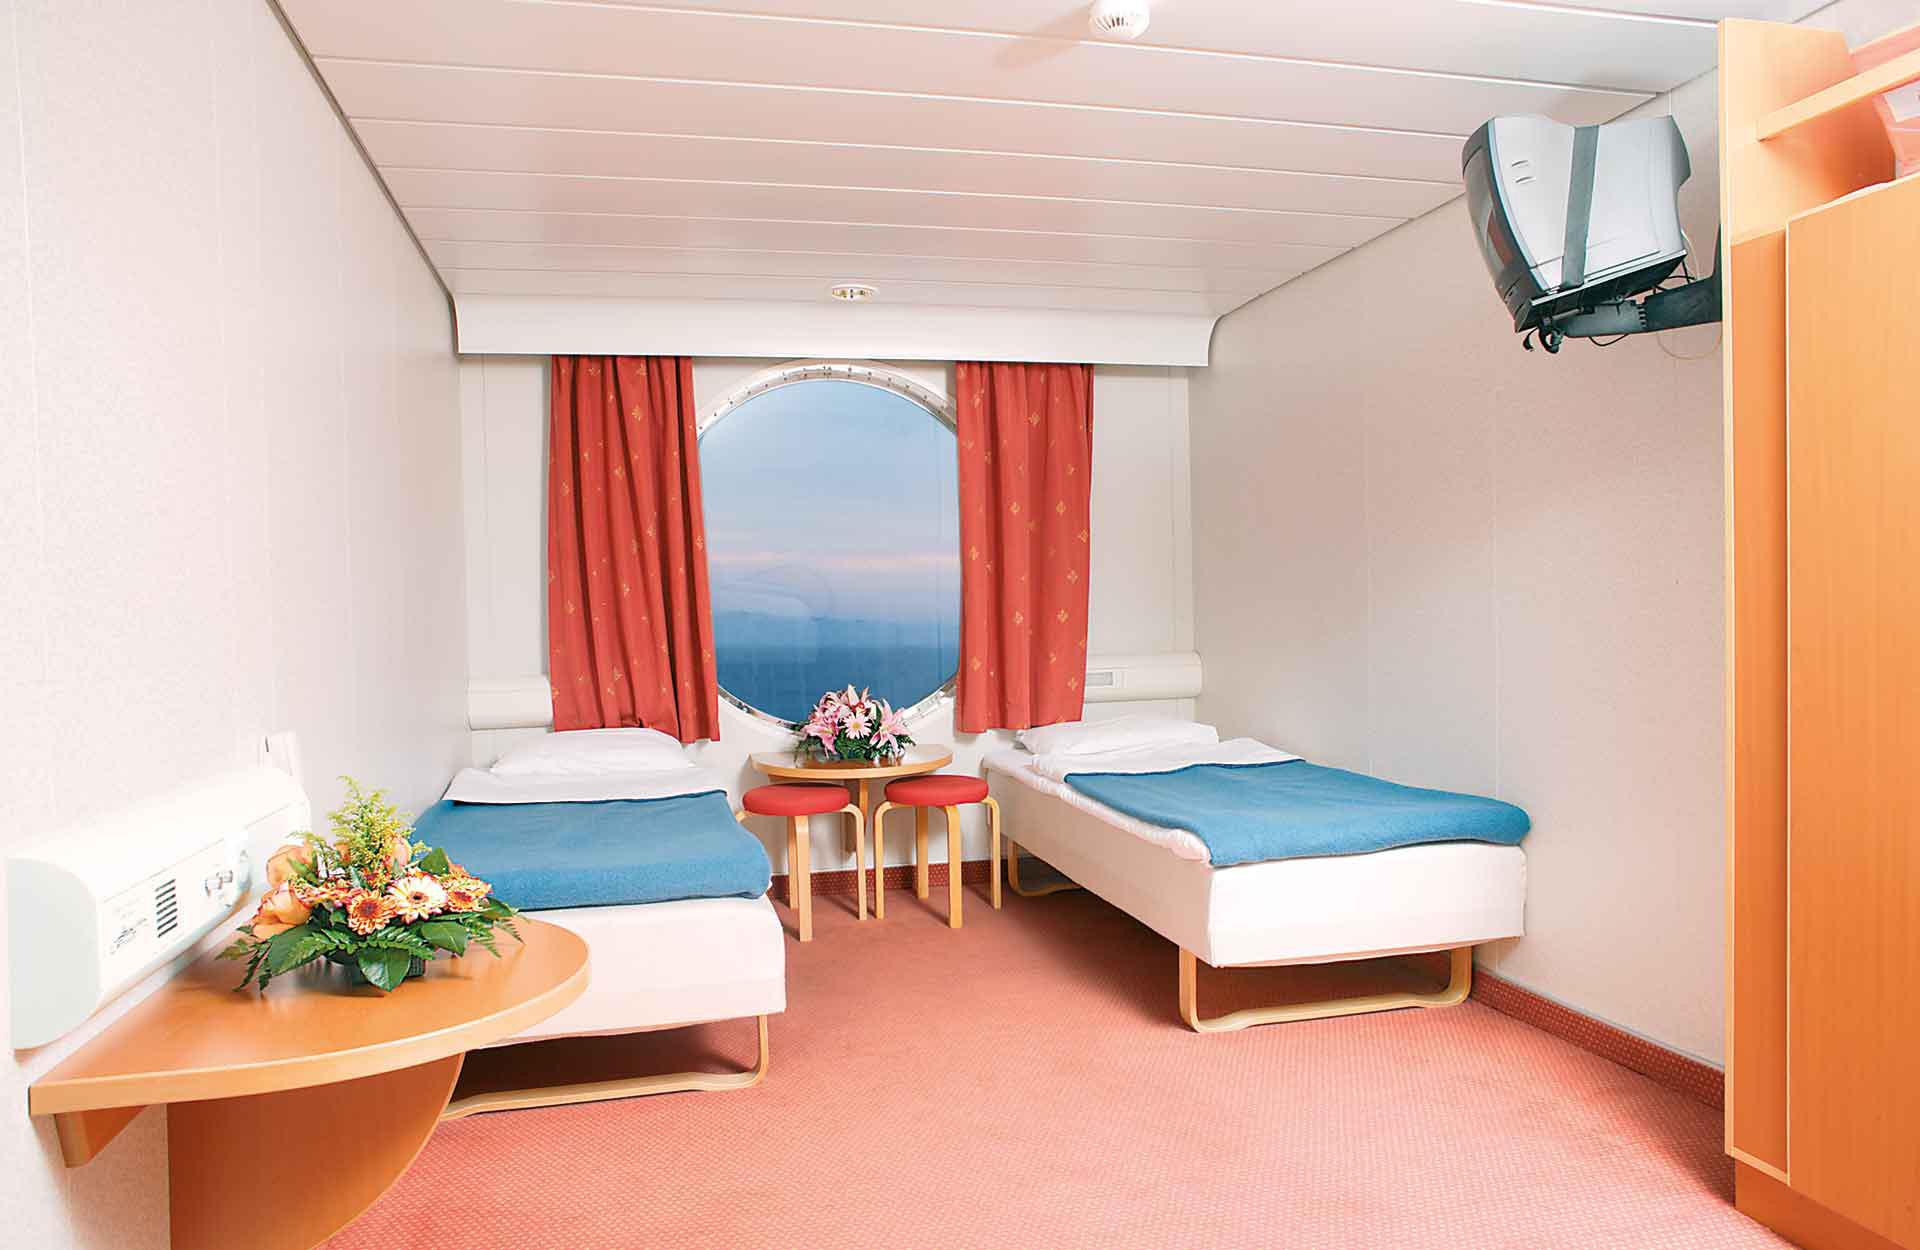 Cabina doppia, Hellenic Spirit, Traghetti Grecia Anek